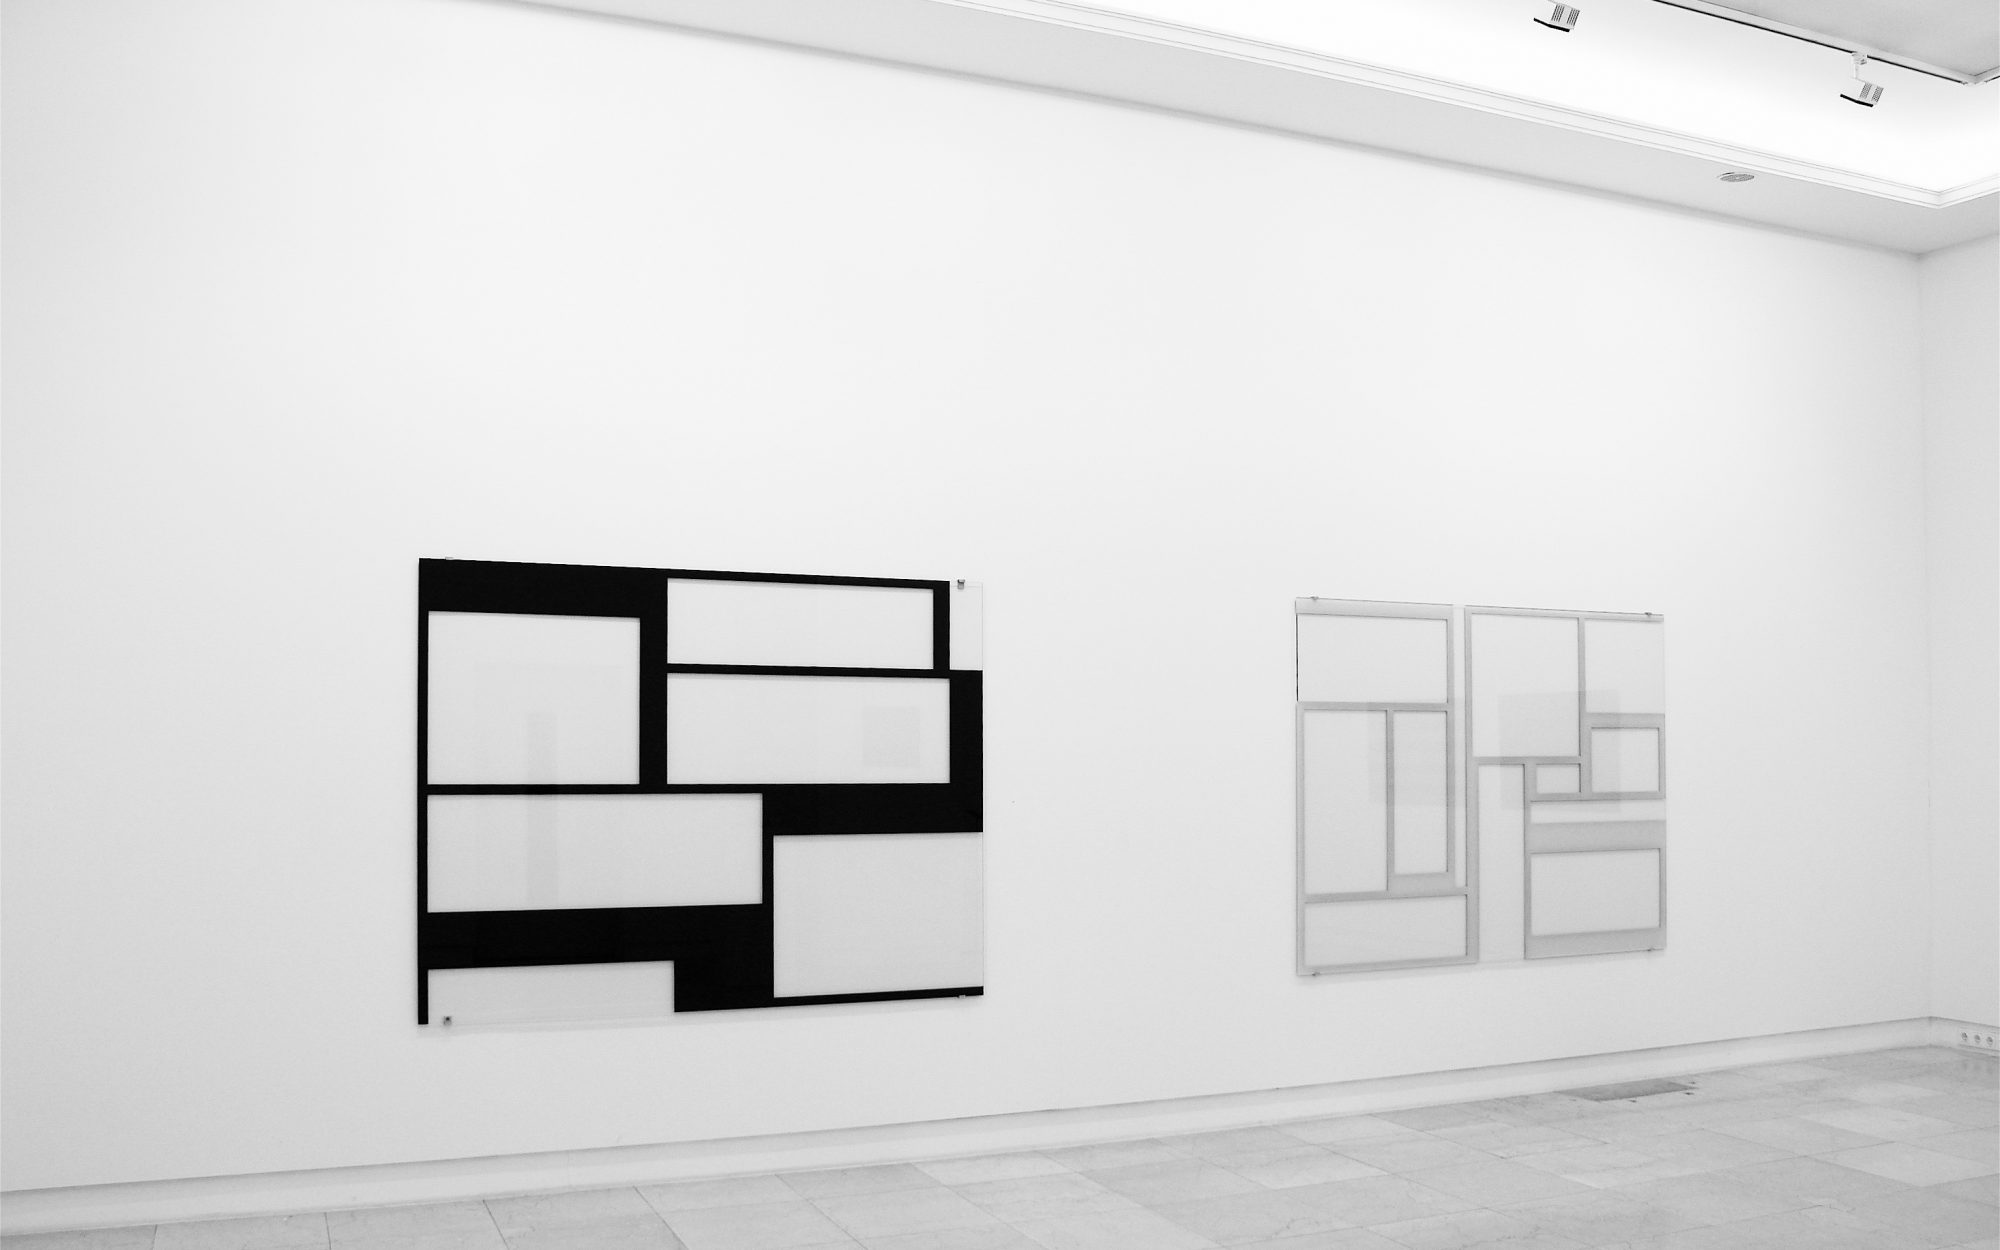 2005, Hinterglasmalerei / reverse glass painting, 150x200cm <br> Weiß / White, 2005, Hinterglasmalerei / reverse glass painting, 150x200cm